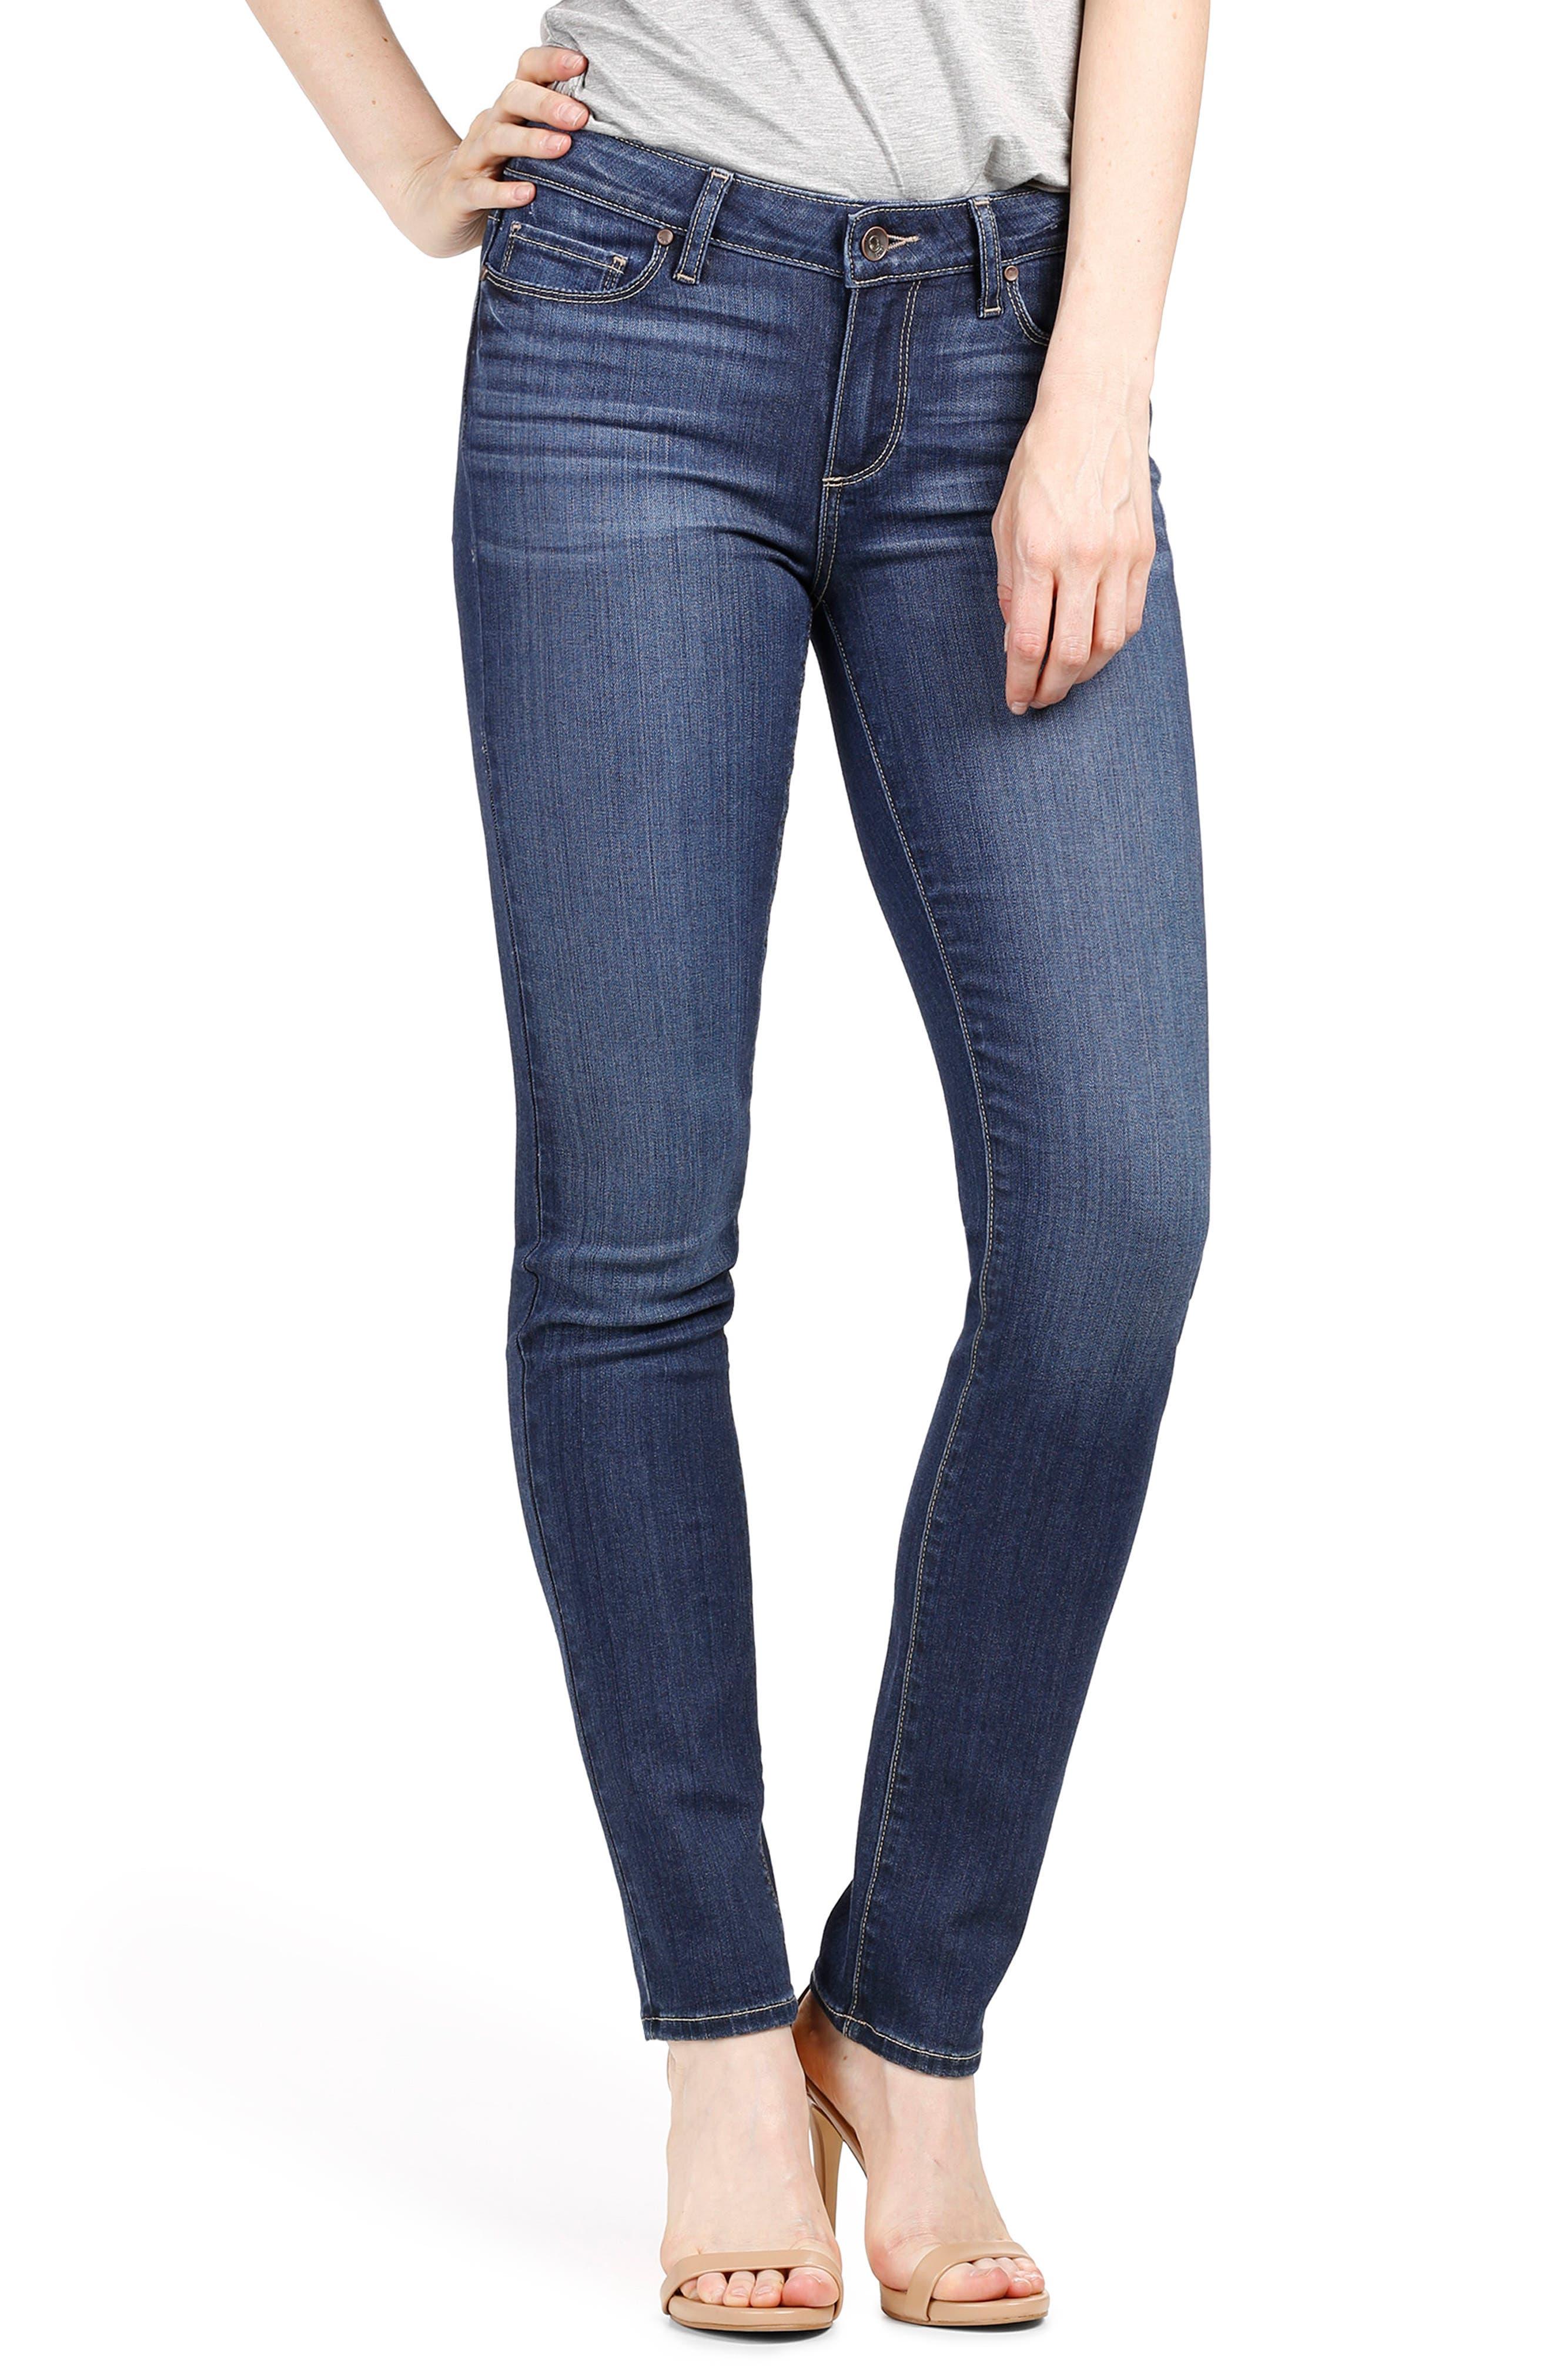 Transcend - Skyline Skinny Jeans,                             Main thumbnail 1, color,                             Blue